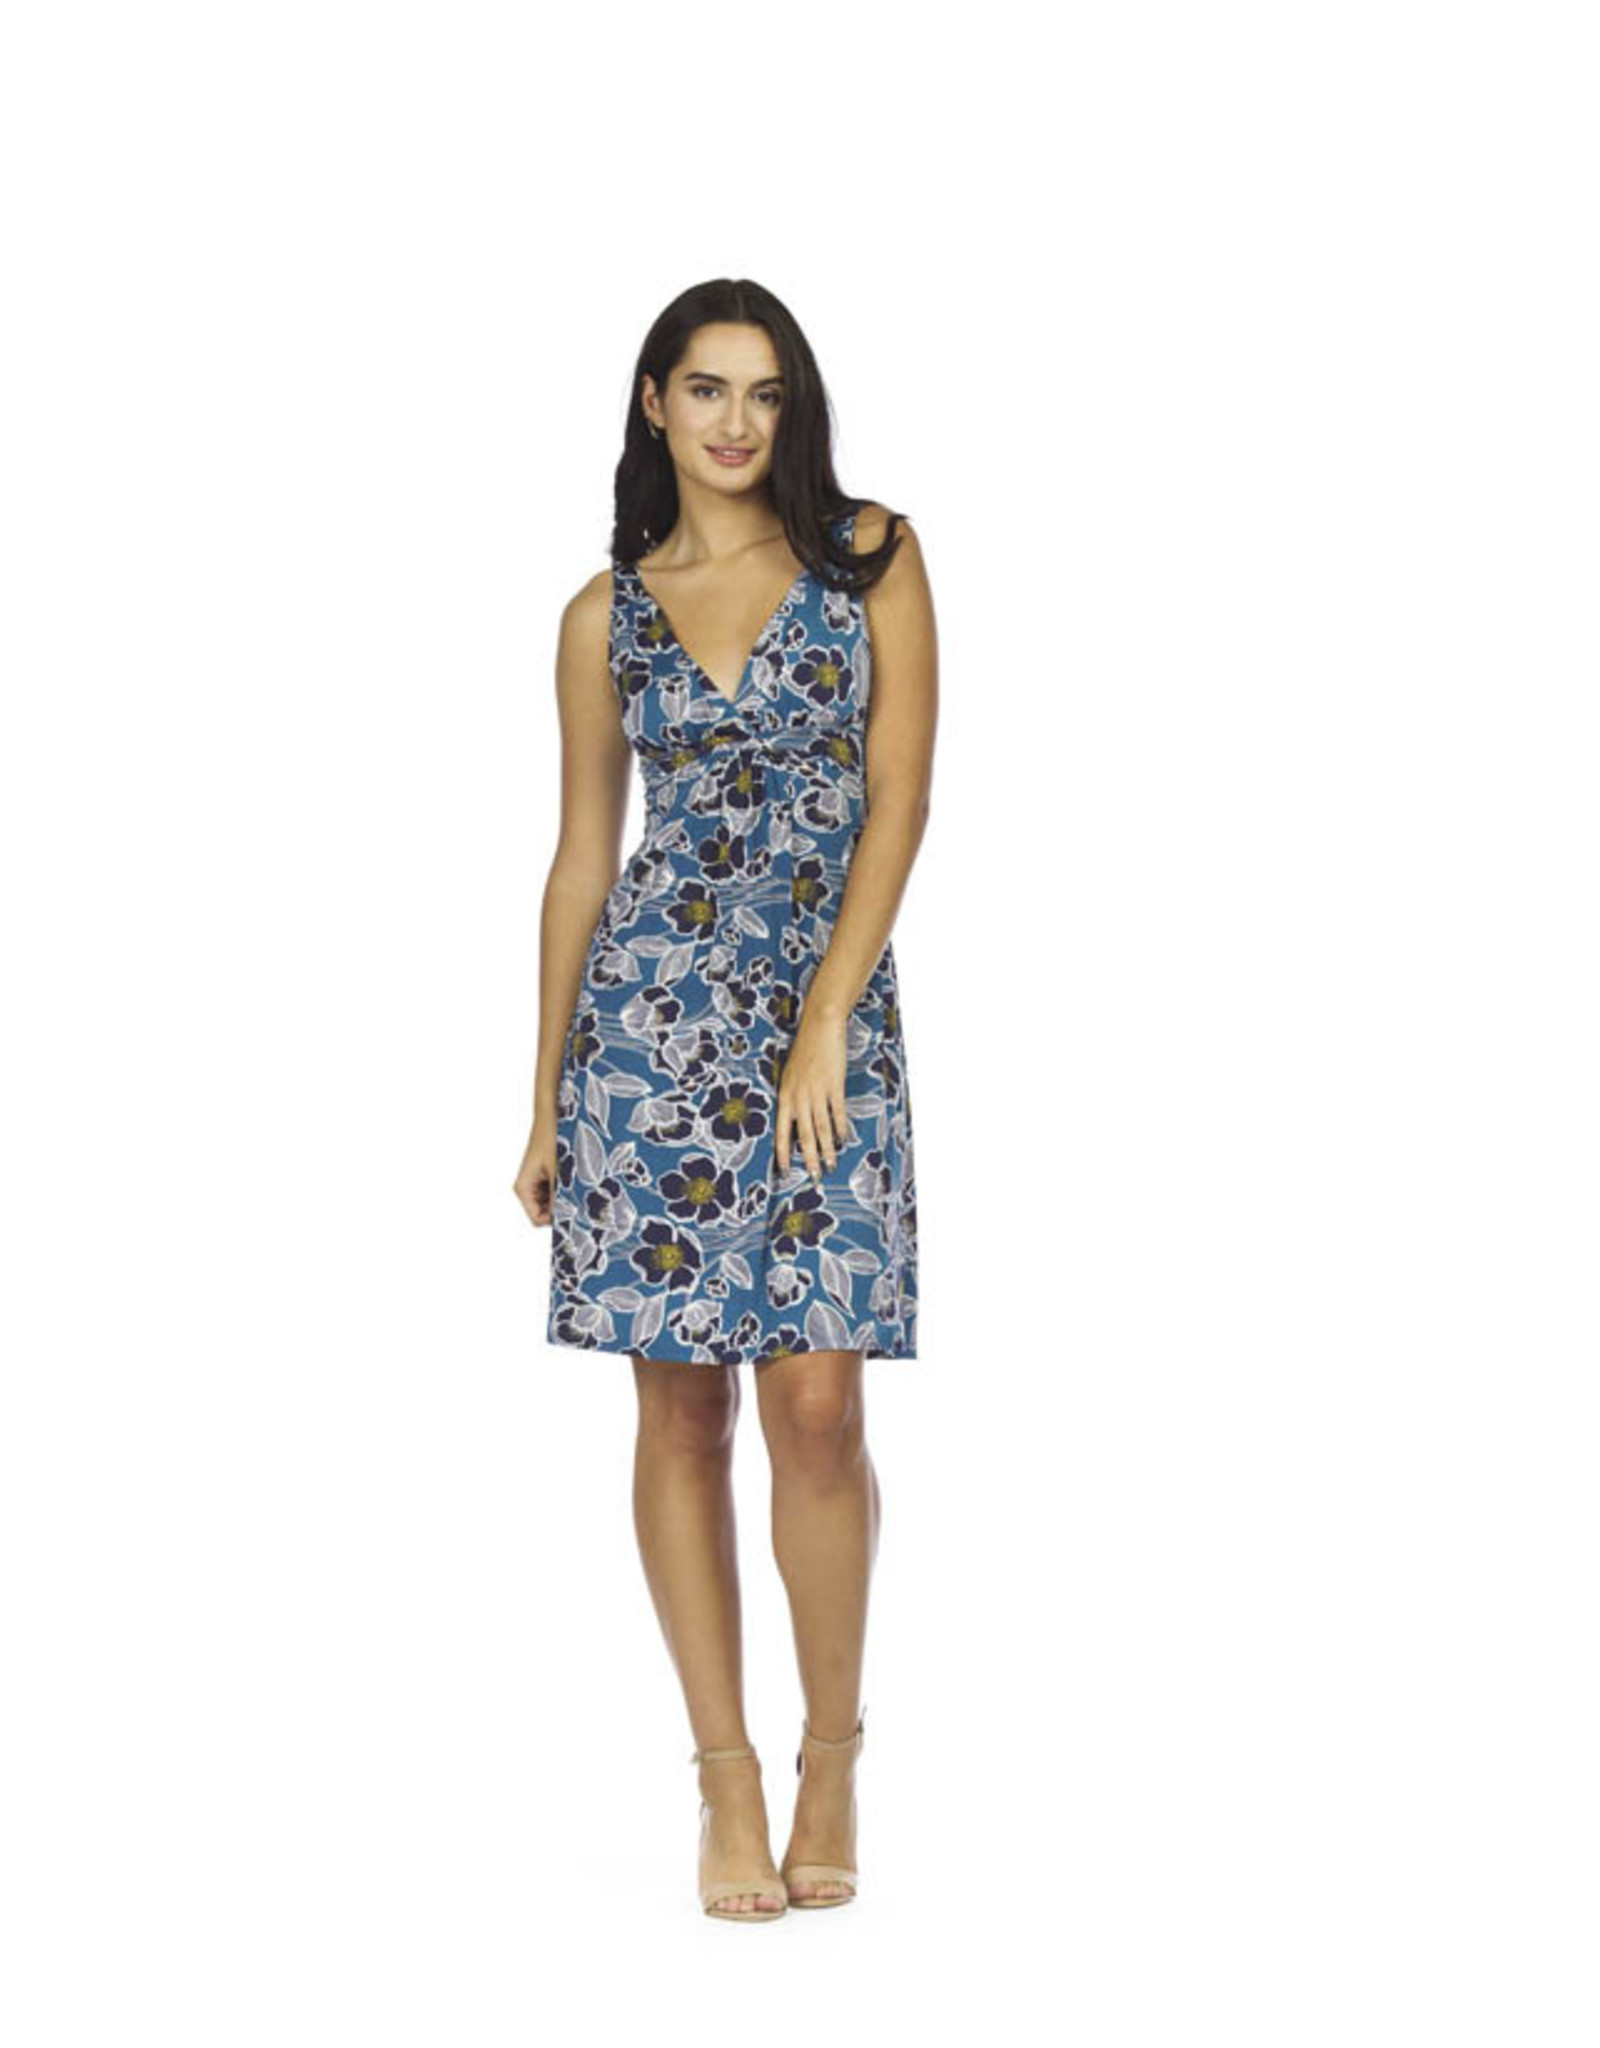 Papillon Papillon - Textured floral Grecian dress